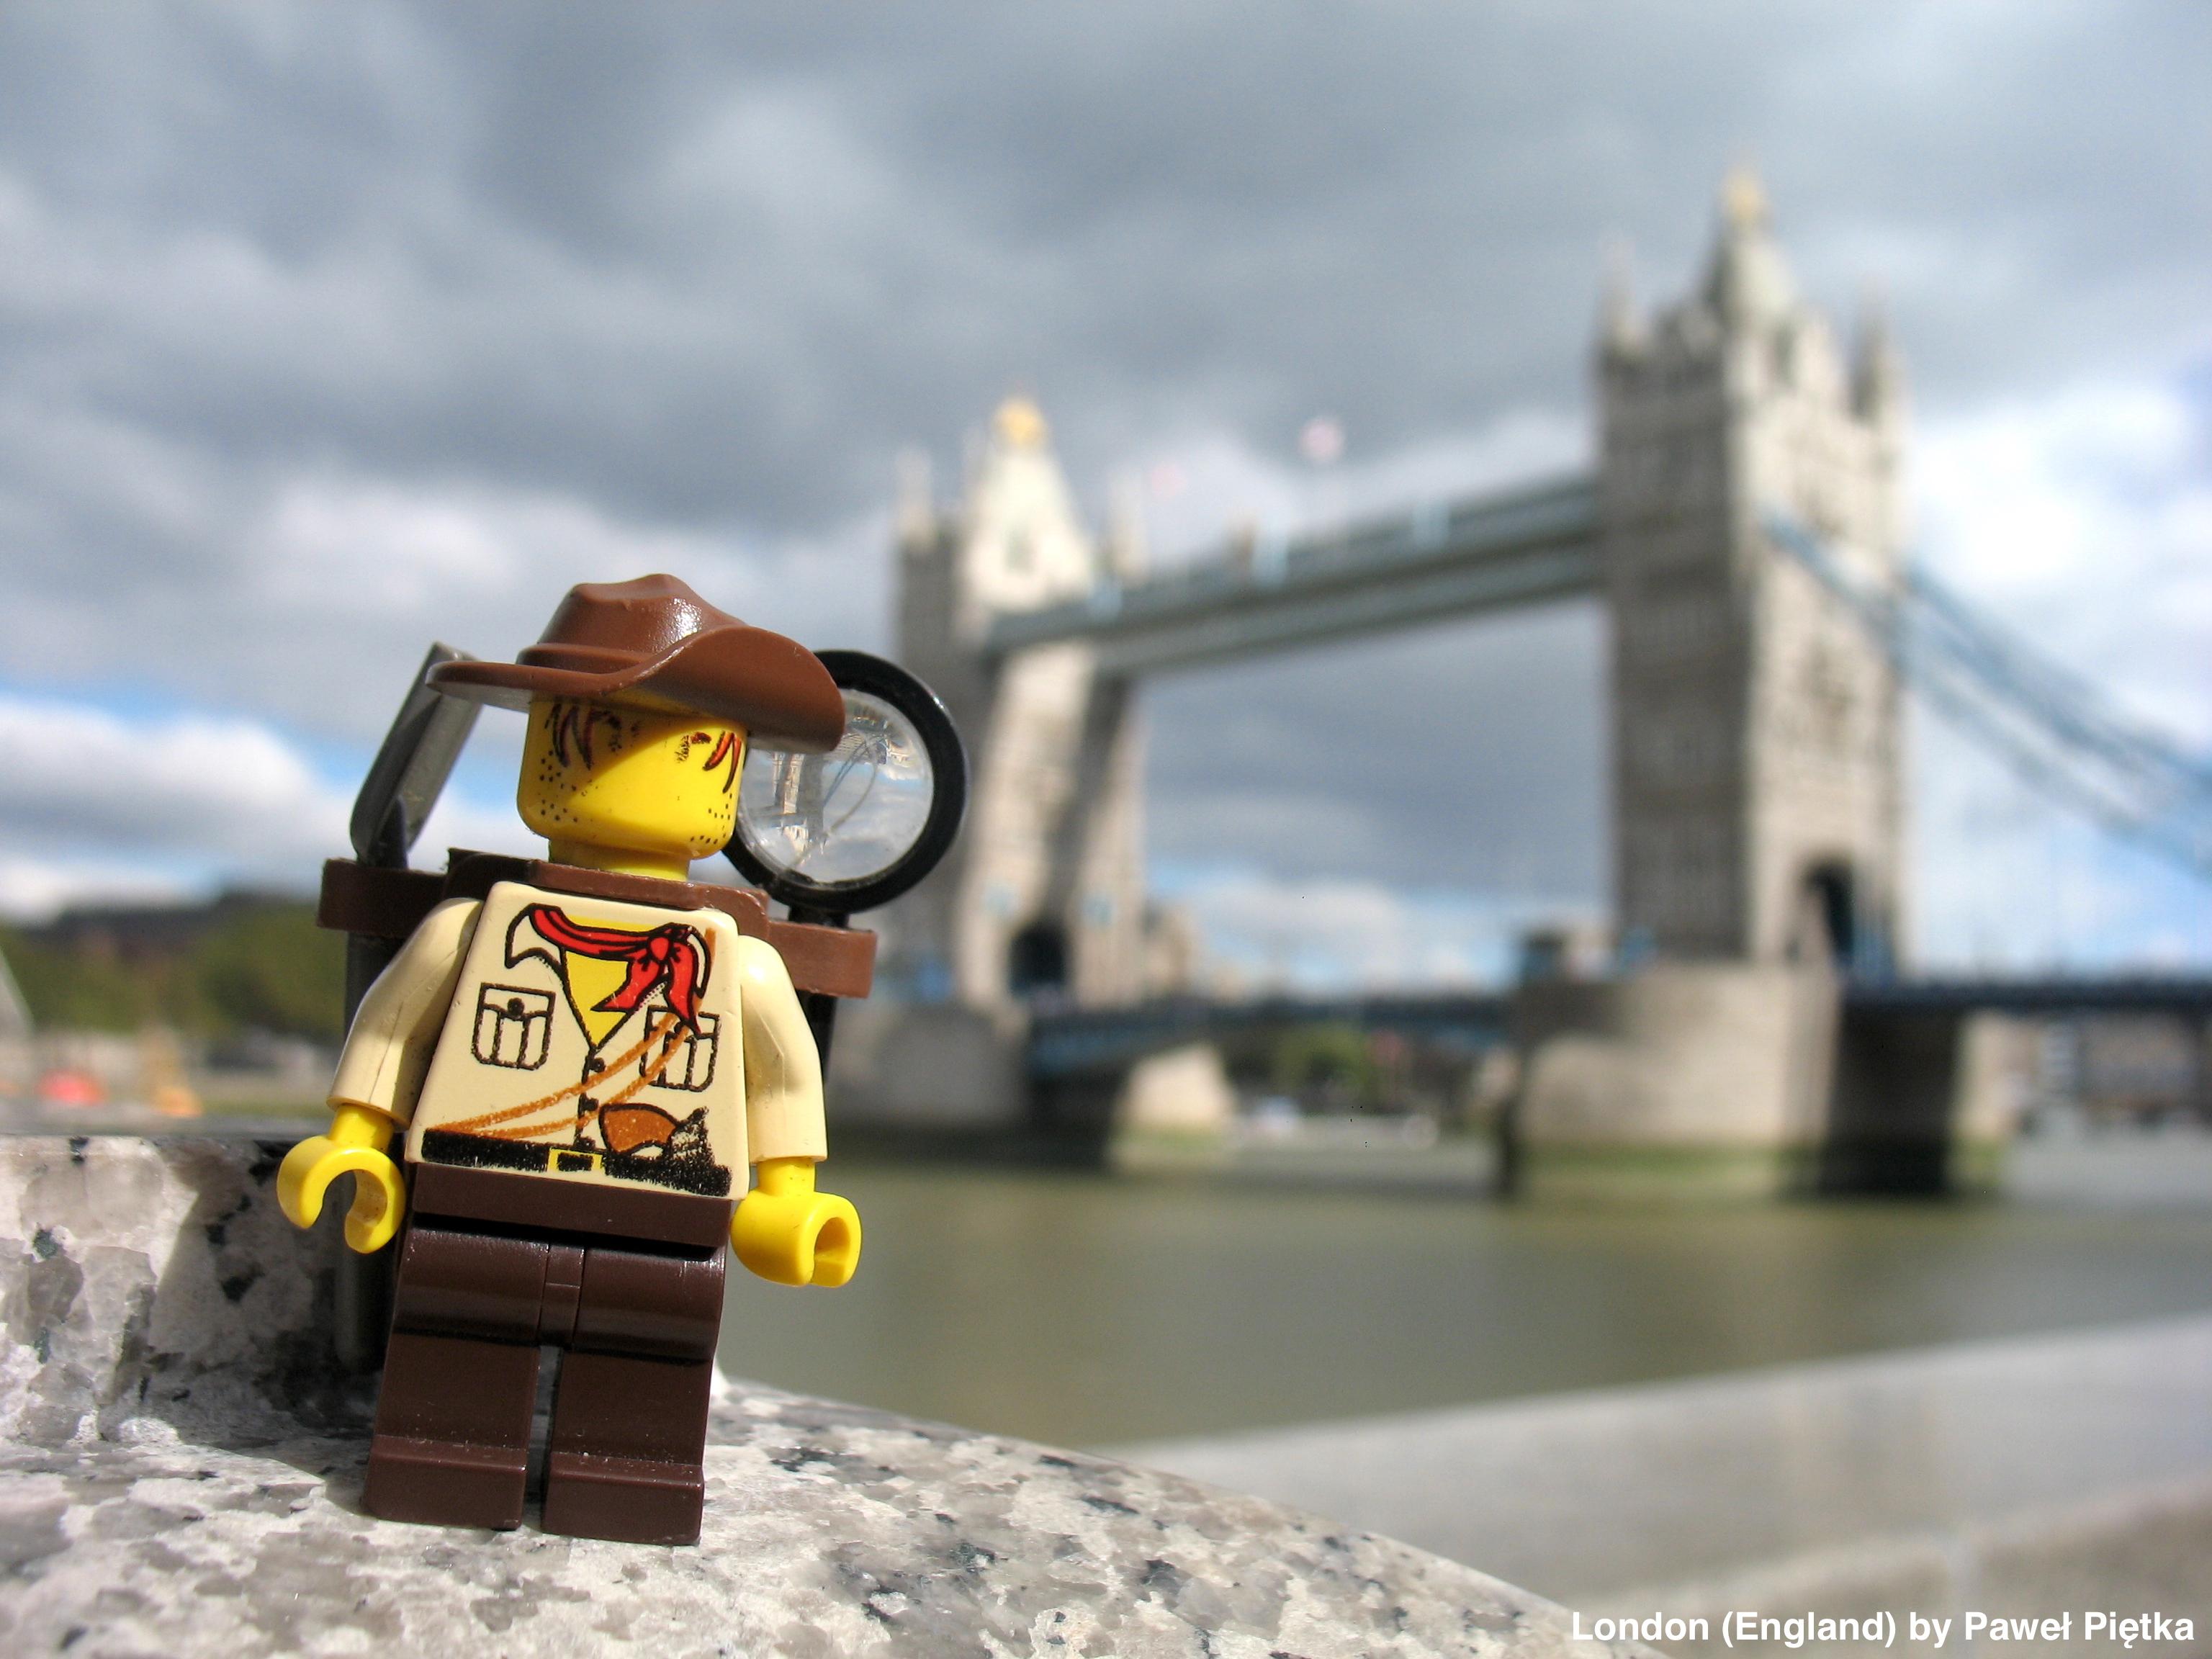 London (England) - Tower Bridge